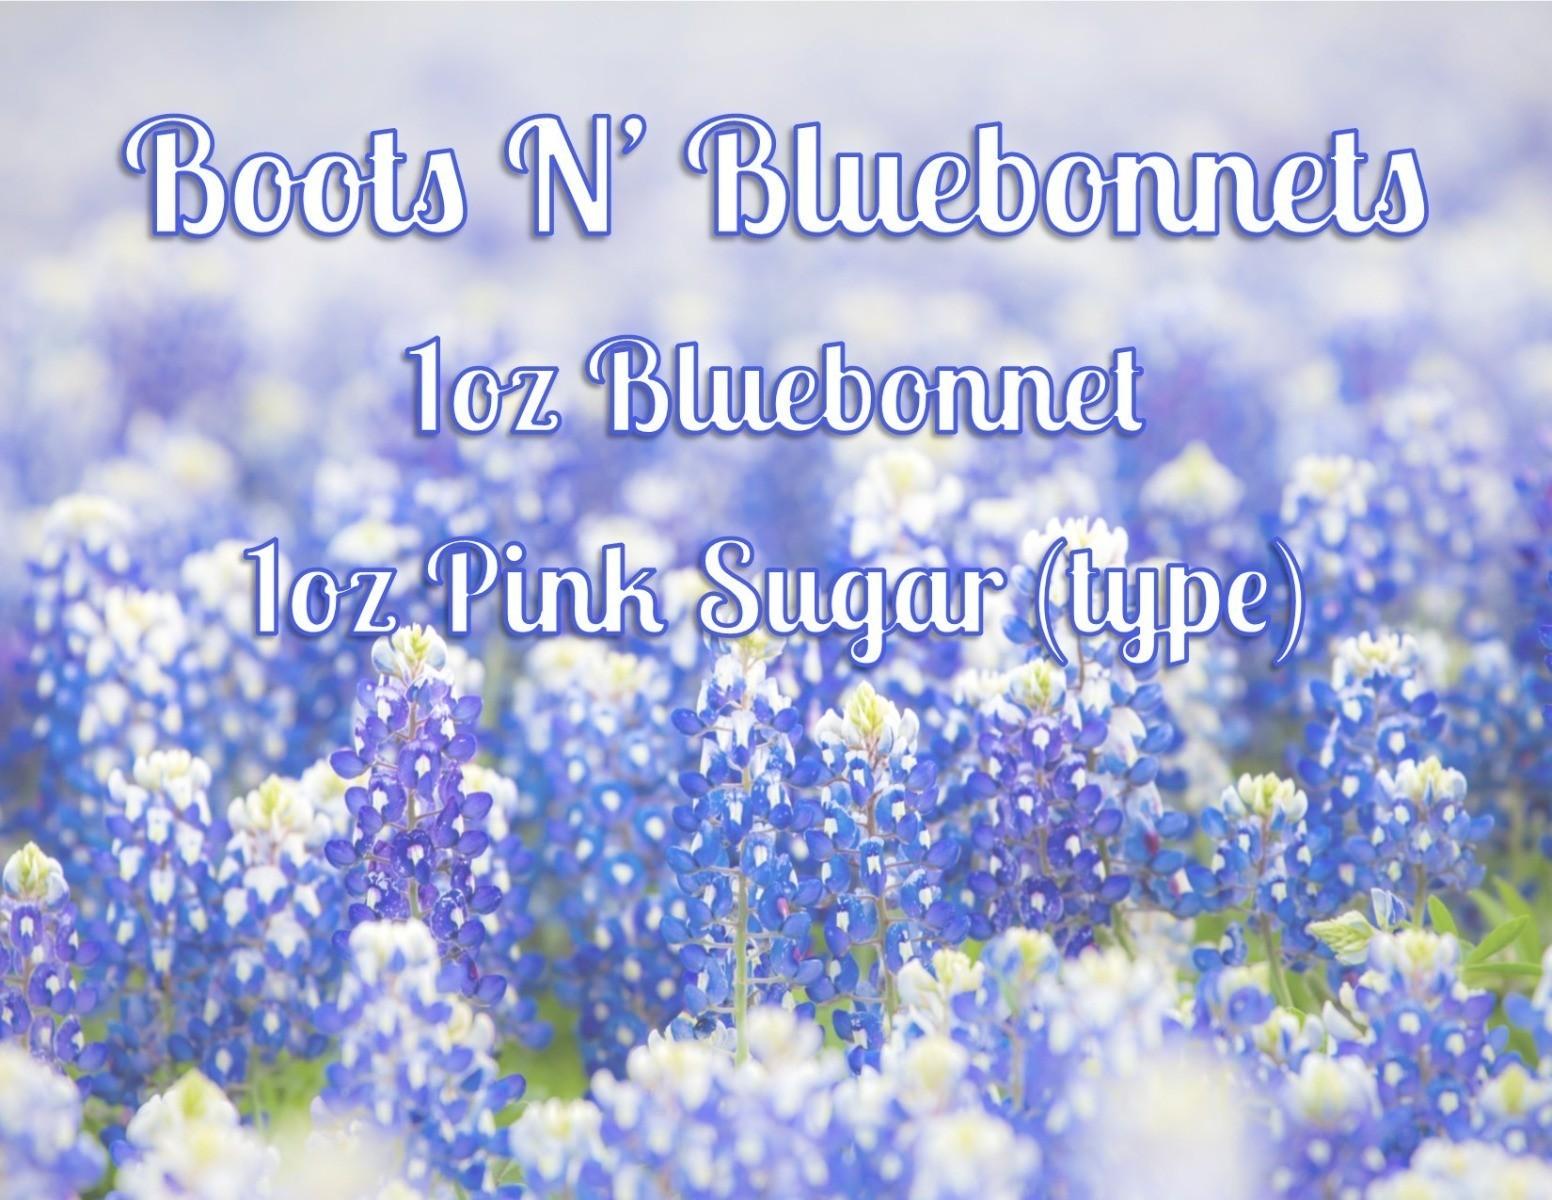 Boots N Bluebonnets